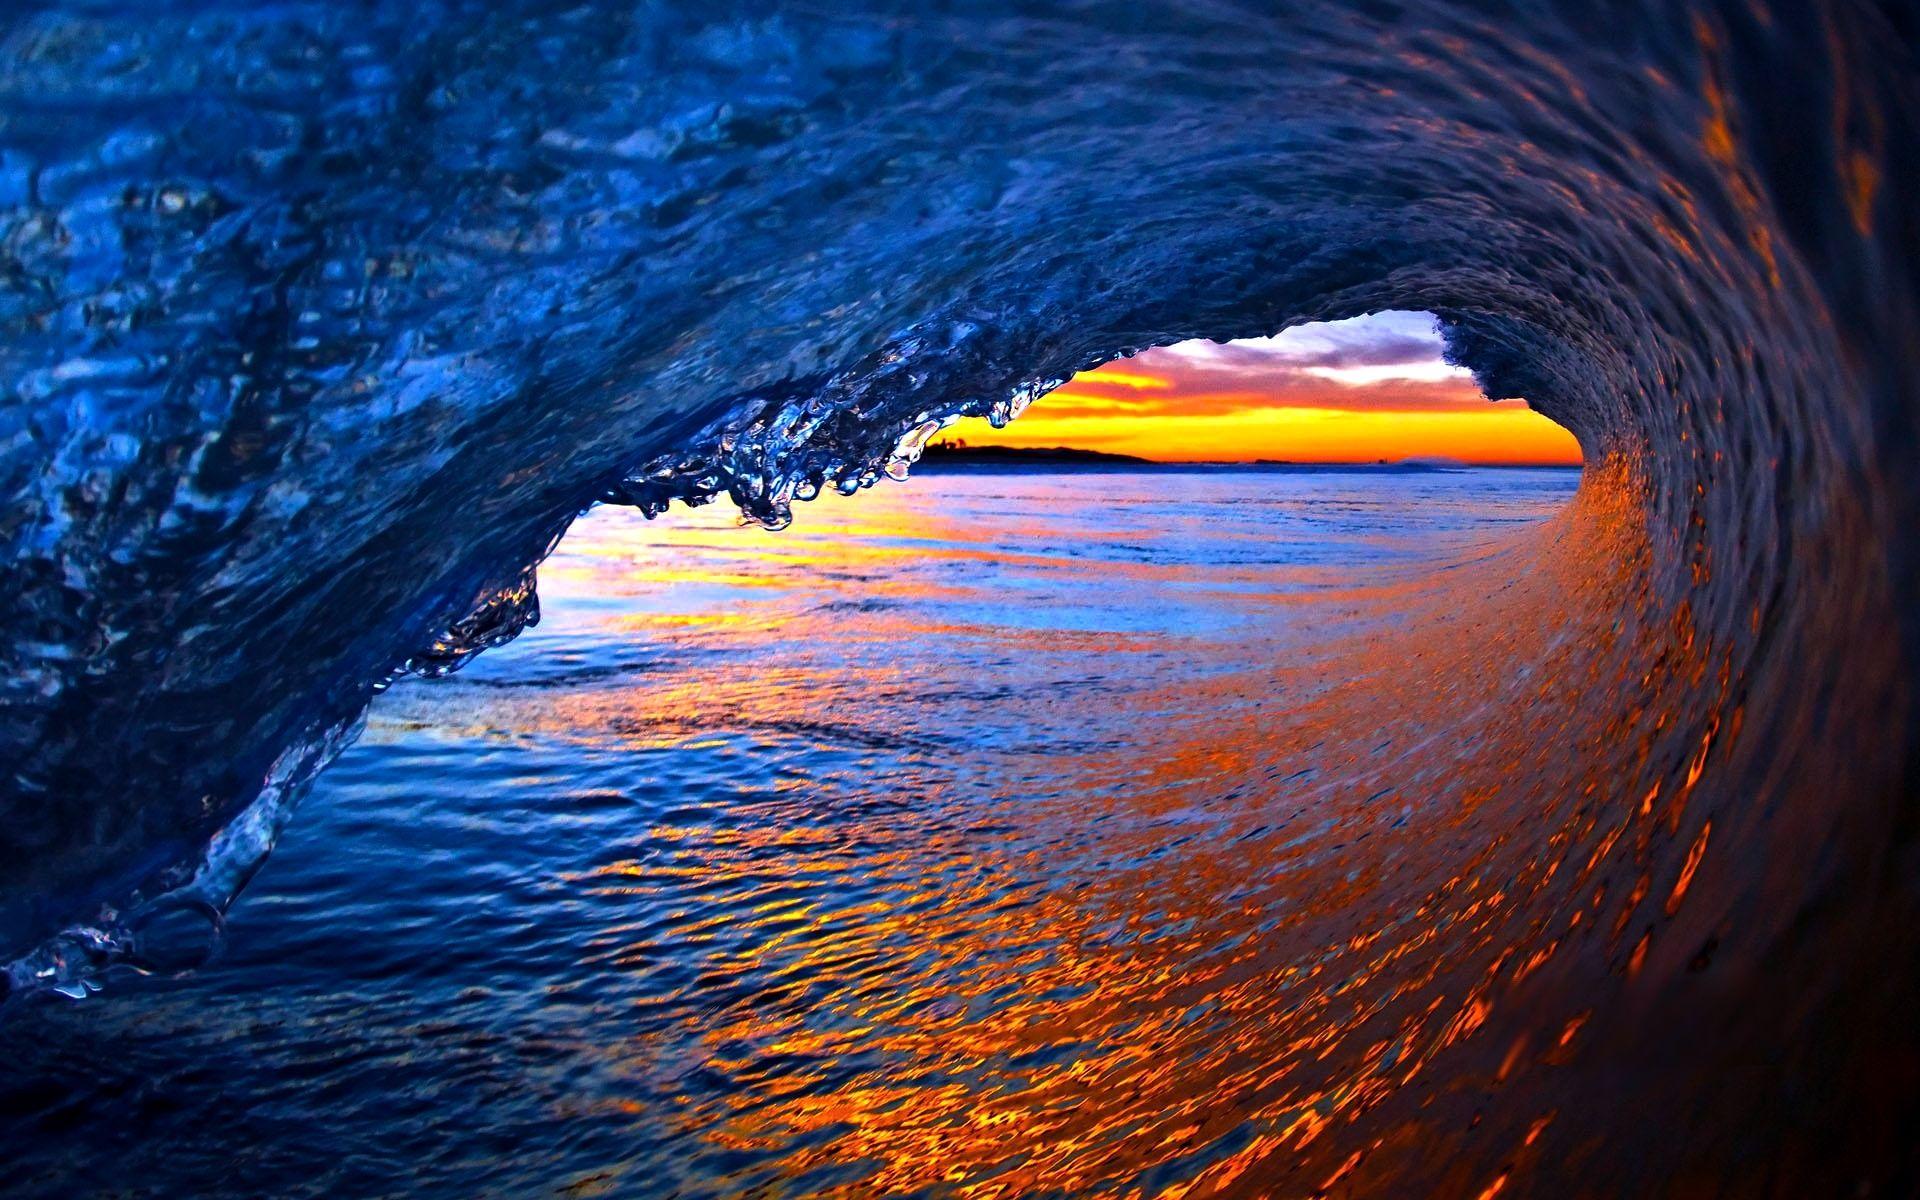 Ocean Waves Wallpaper Wave Curl